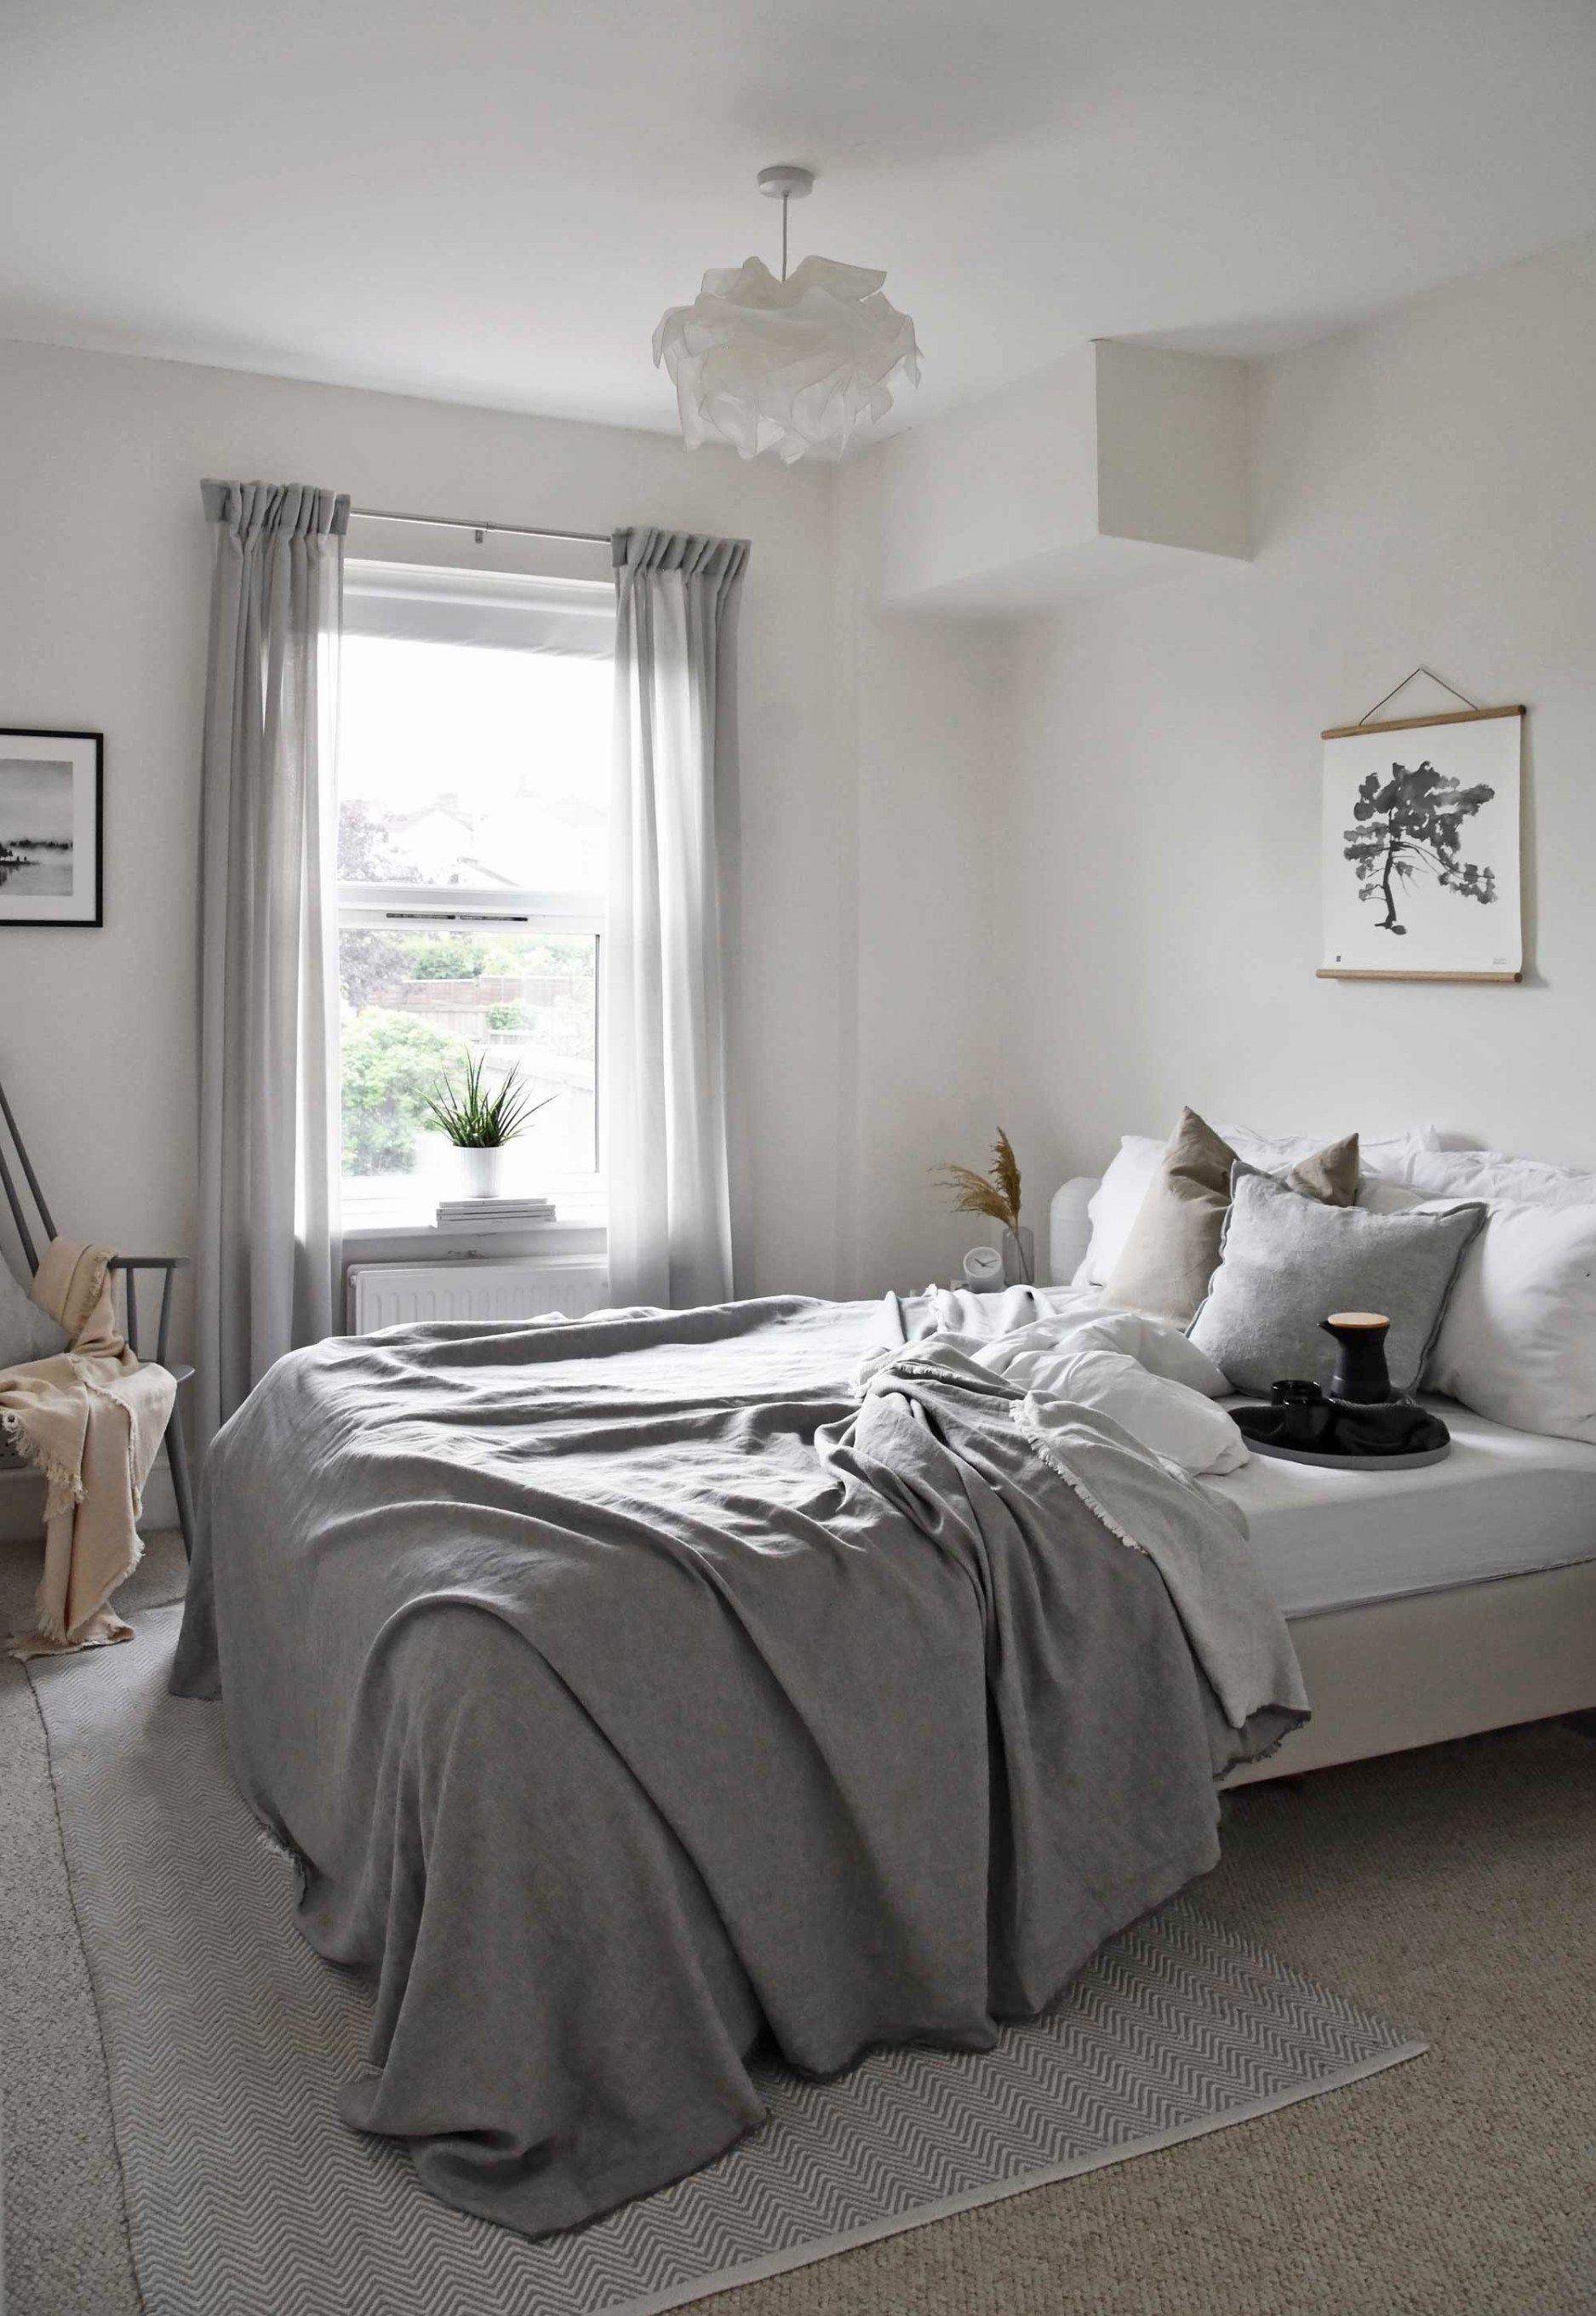 A guest bedroom wall-art update with NØRDIK | Bedroom wall ...